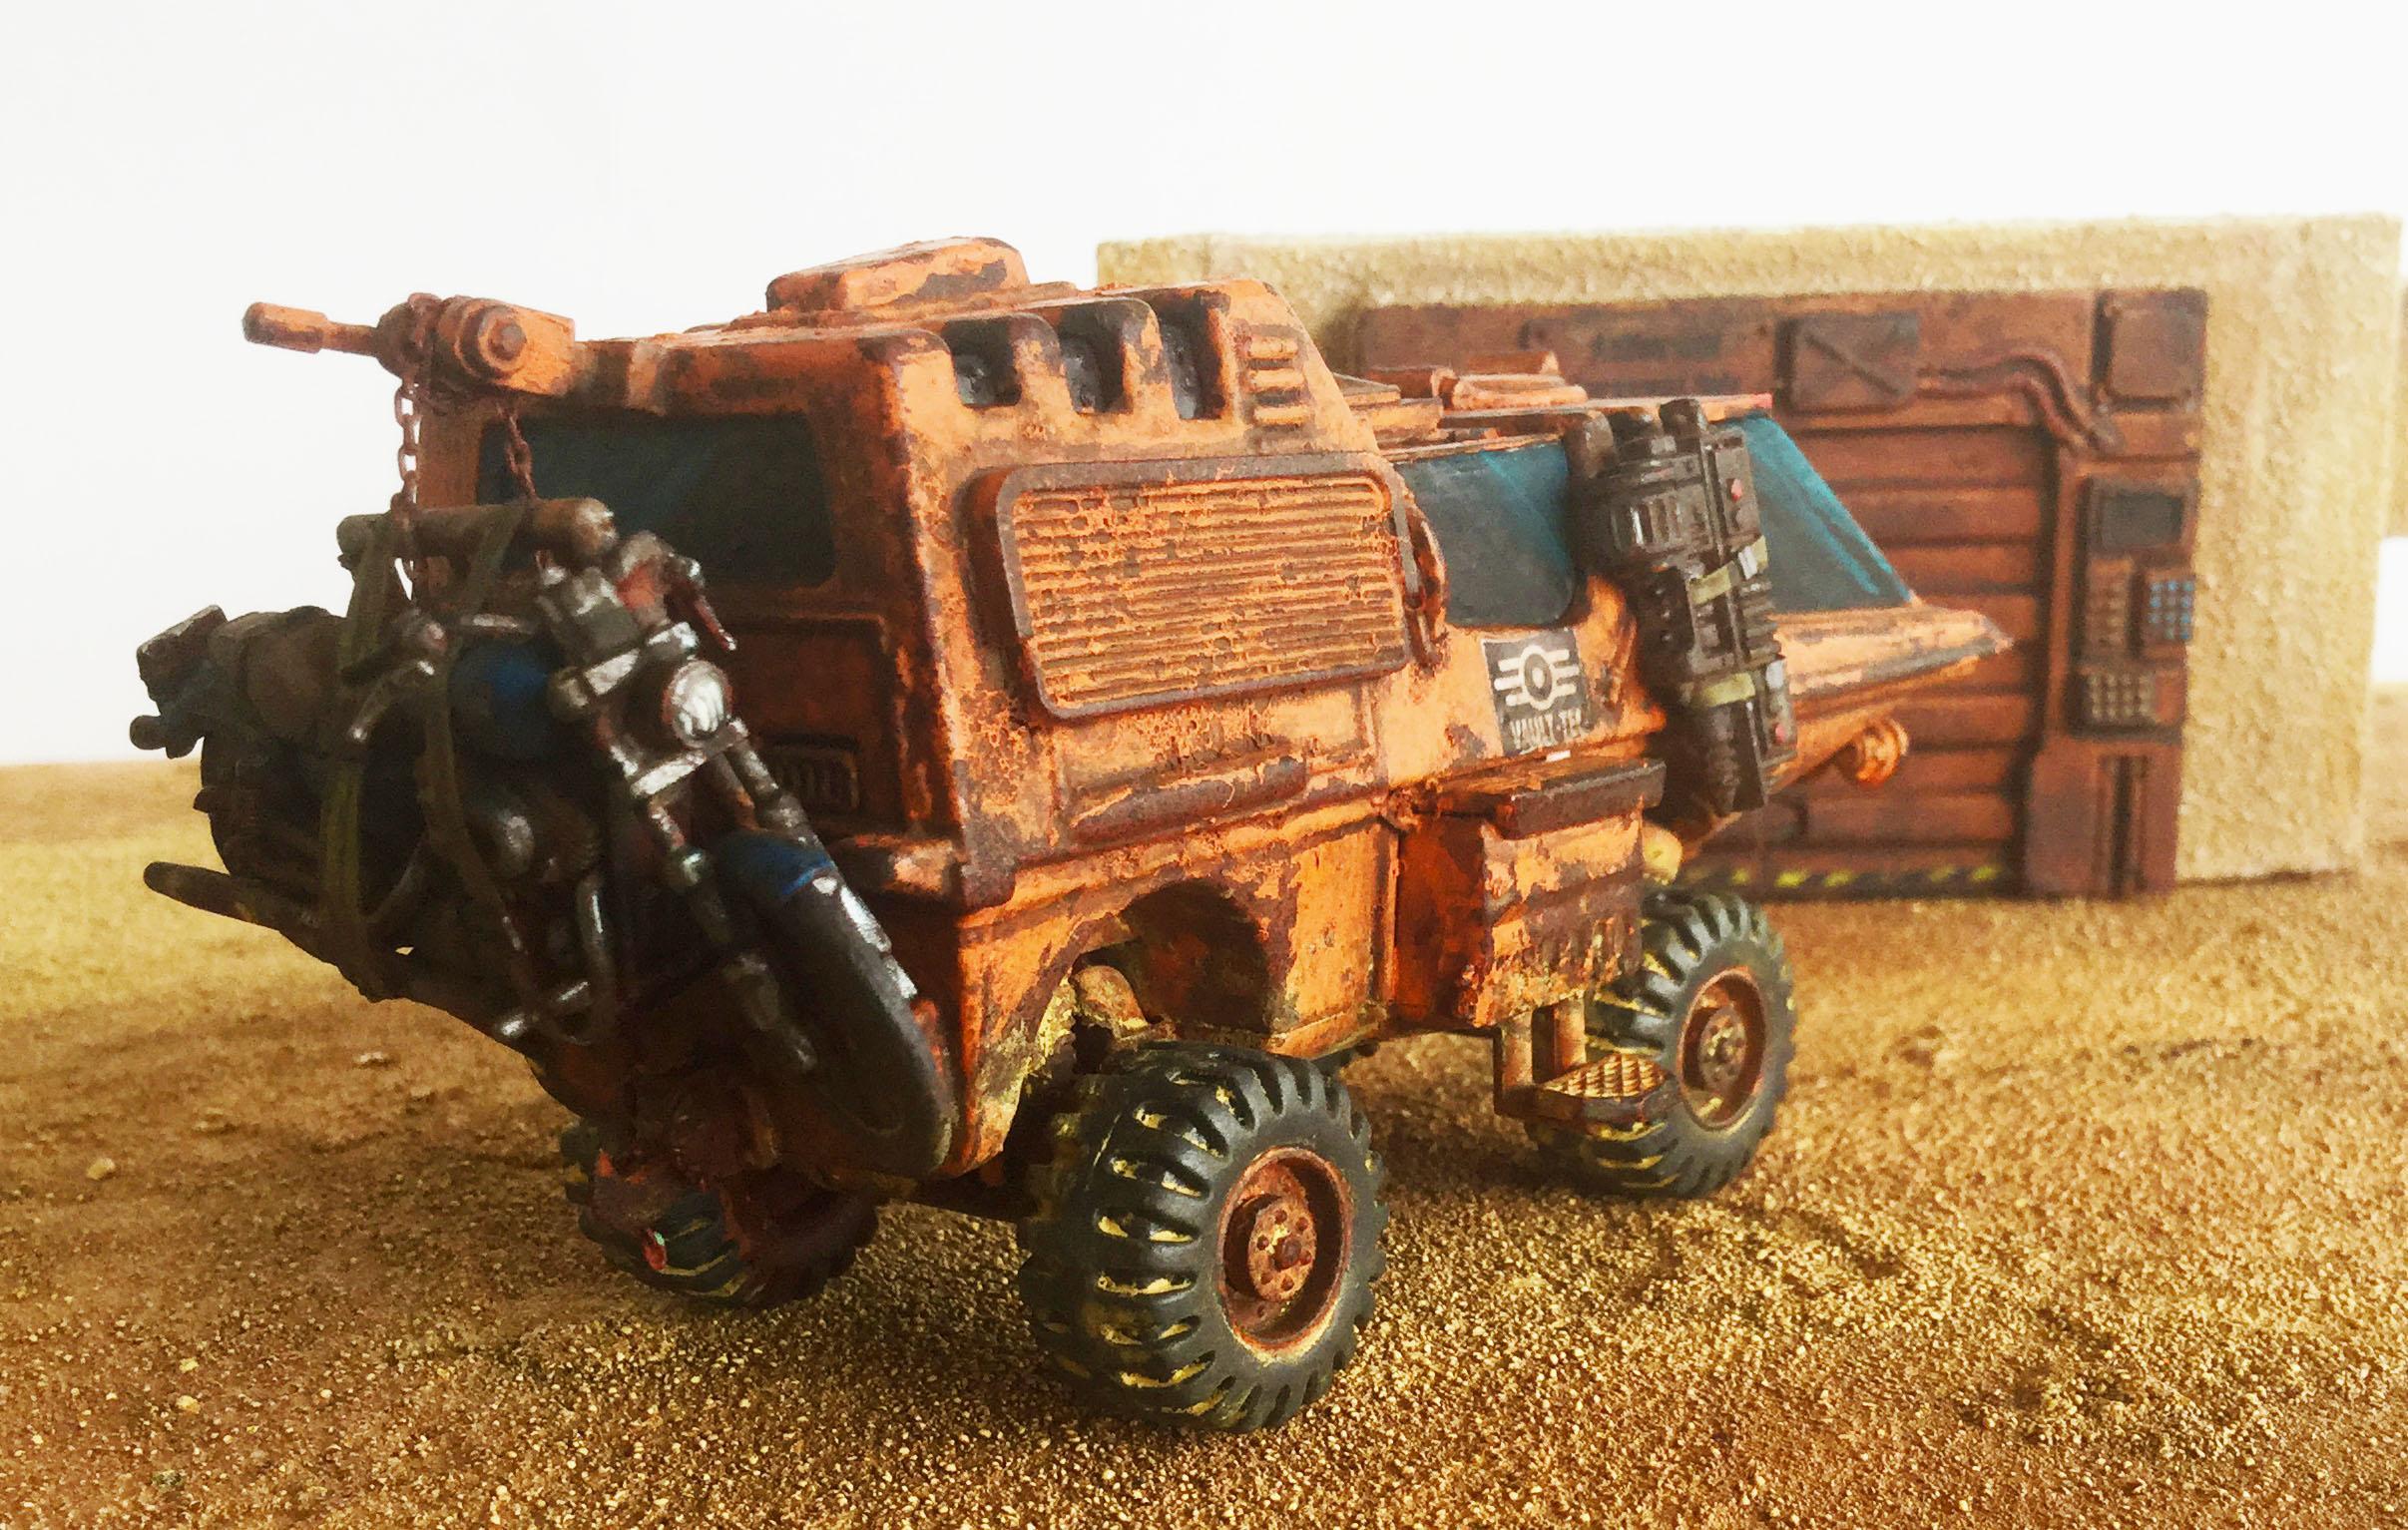 Armored Car, Ash Wastes, Civilian, Fallout, Post Apocalypse, Raiders